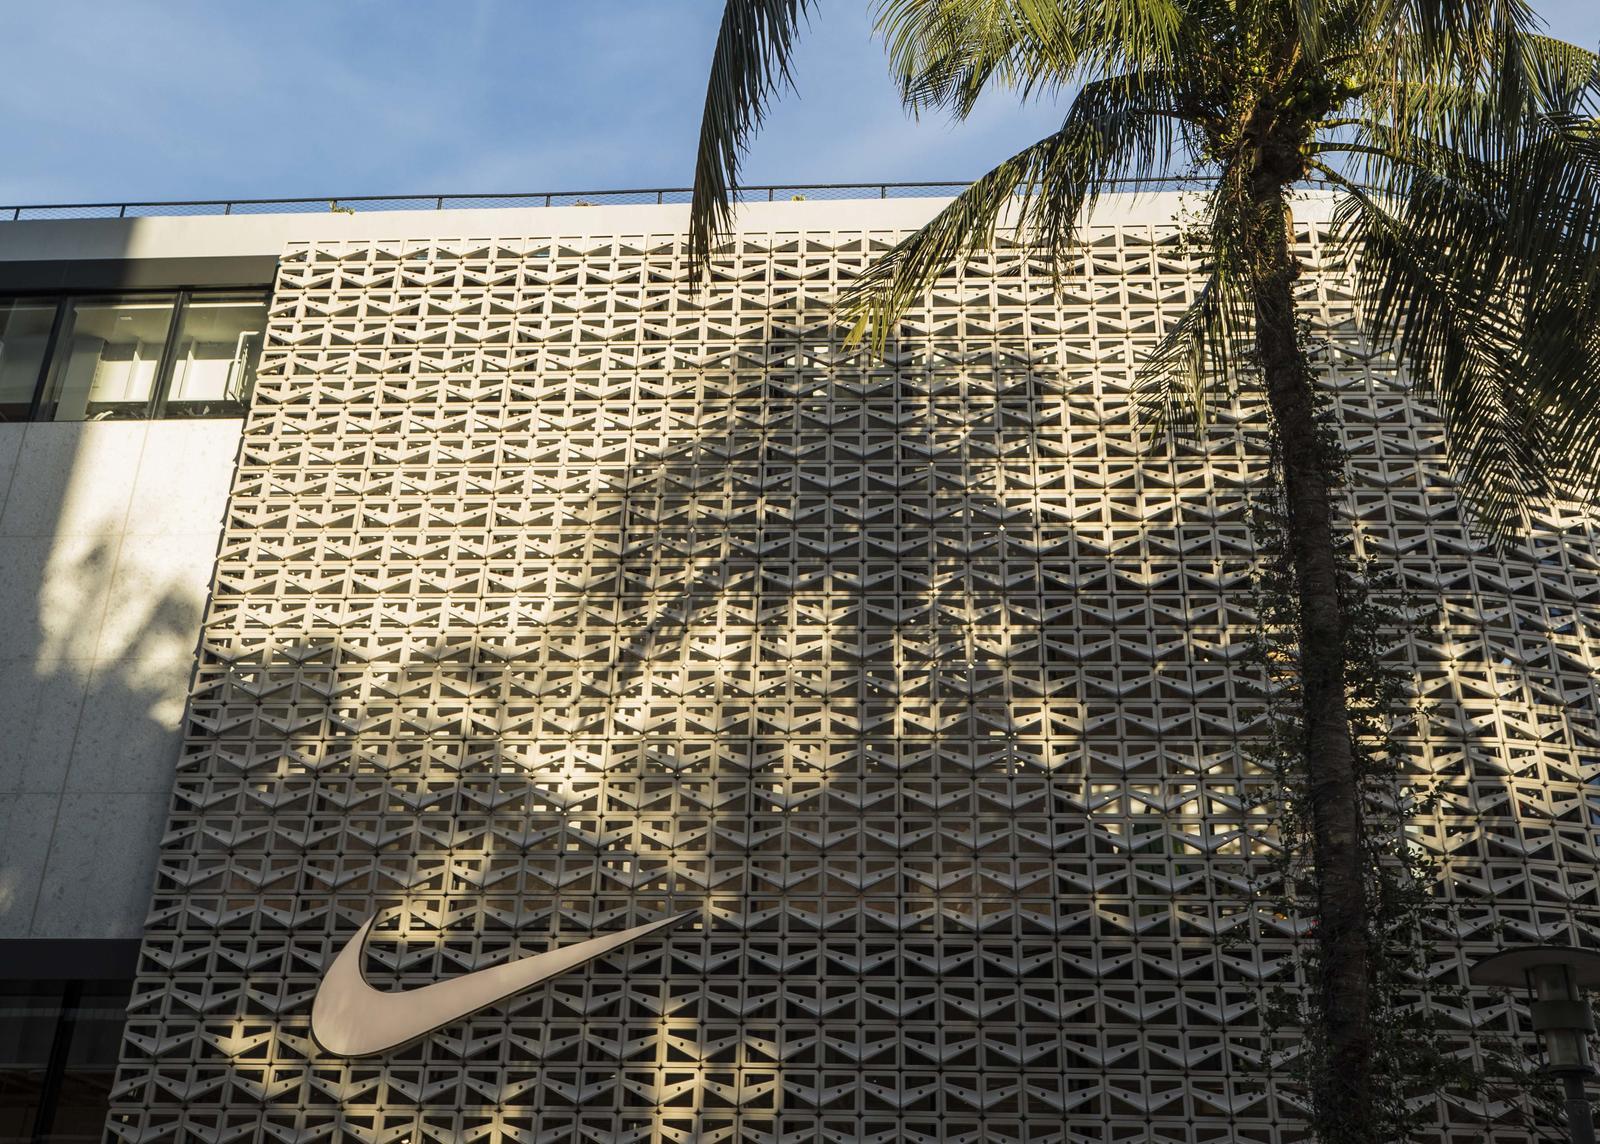 armeria Comprensione asta  First Look: Inside Nike Miami - Nike News